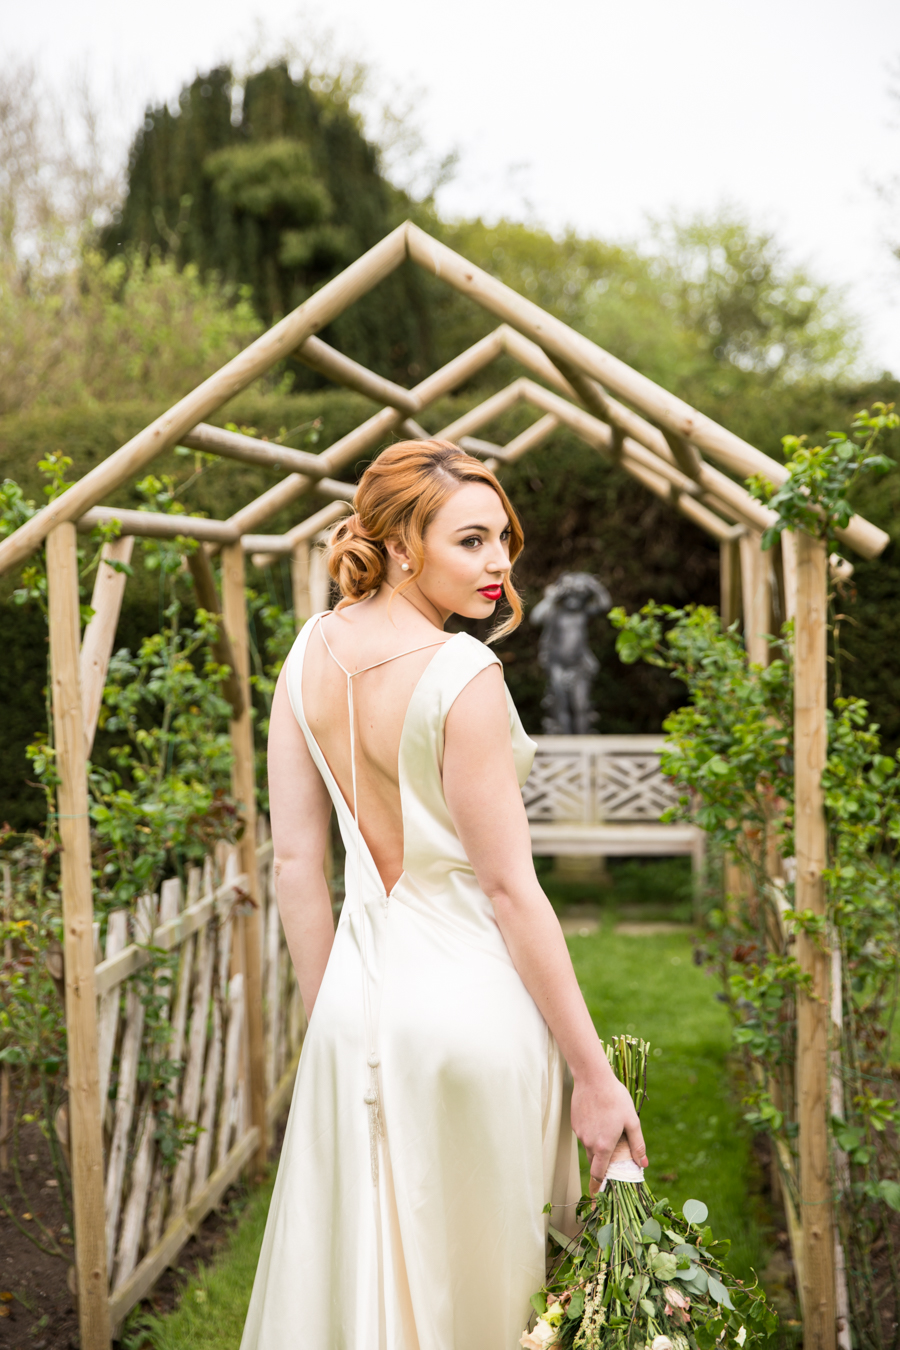 English country garden wedding style ideas with Hannah Larkin Photography (30)